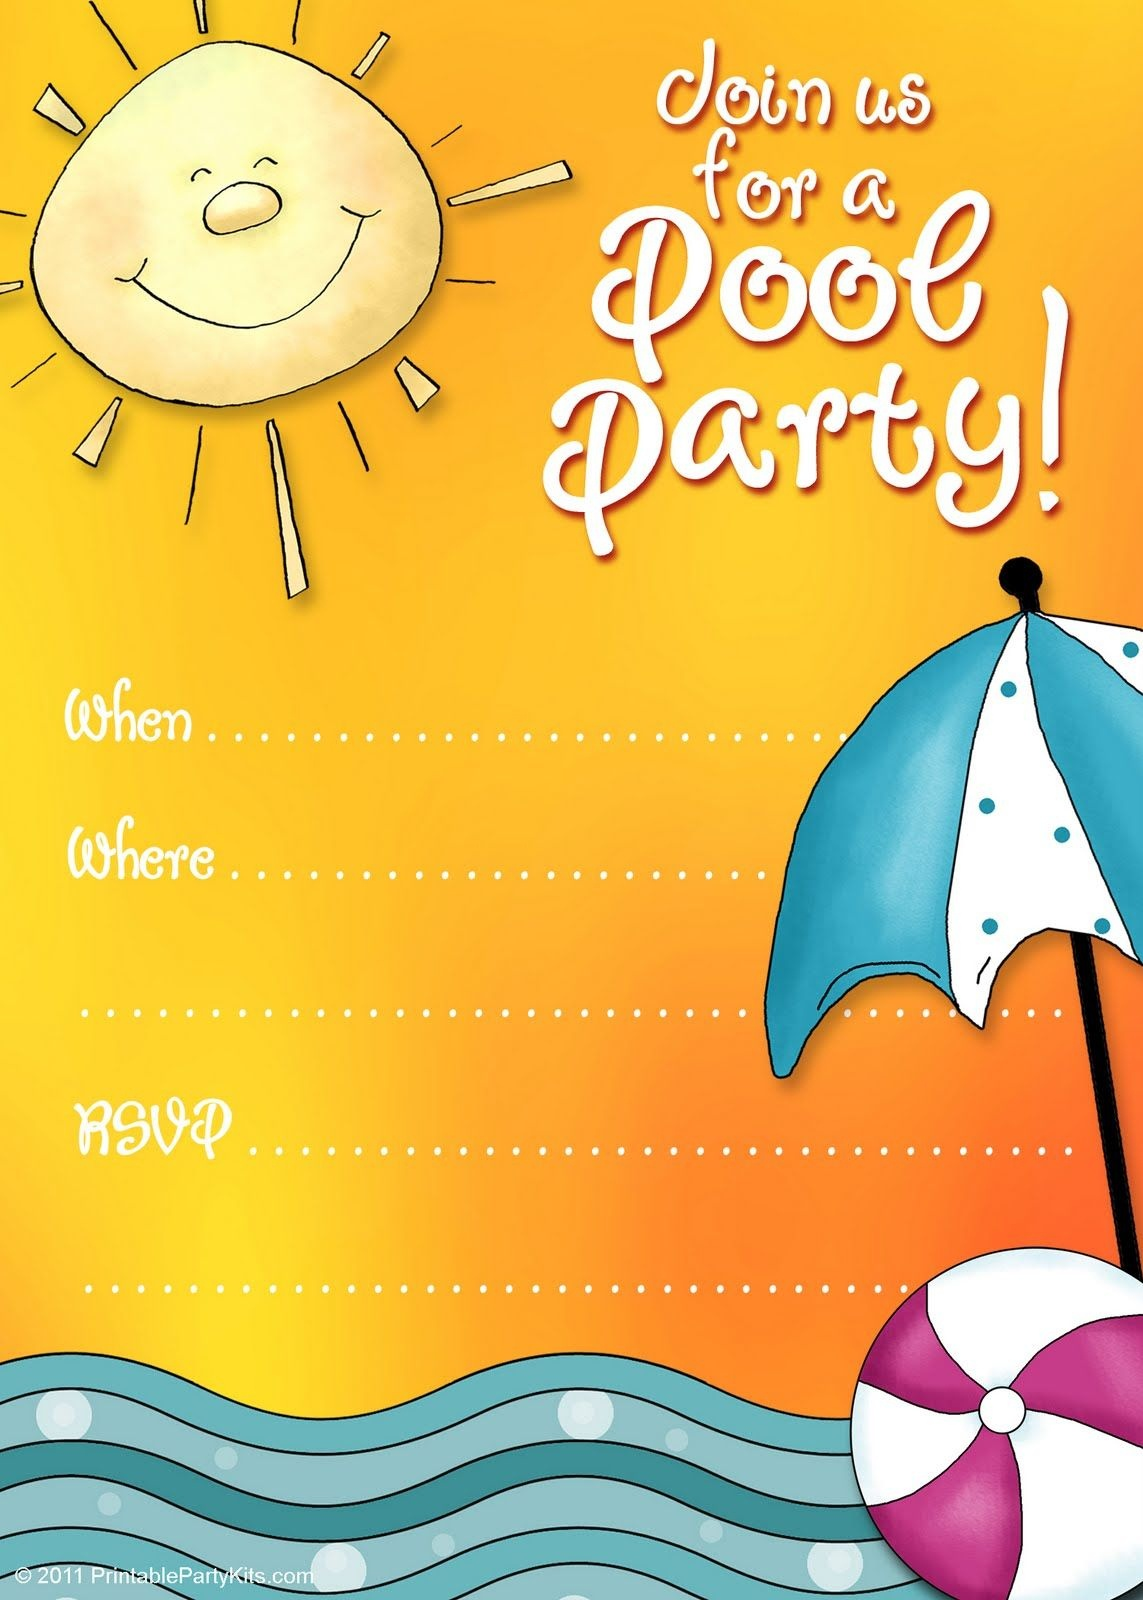 Free Printable Party Invitations: Summer Pool Party Invites   Adhd - Free Printable Pool Party Birthday Invitations